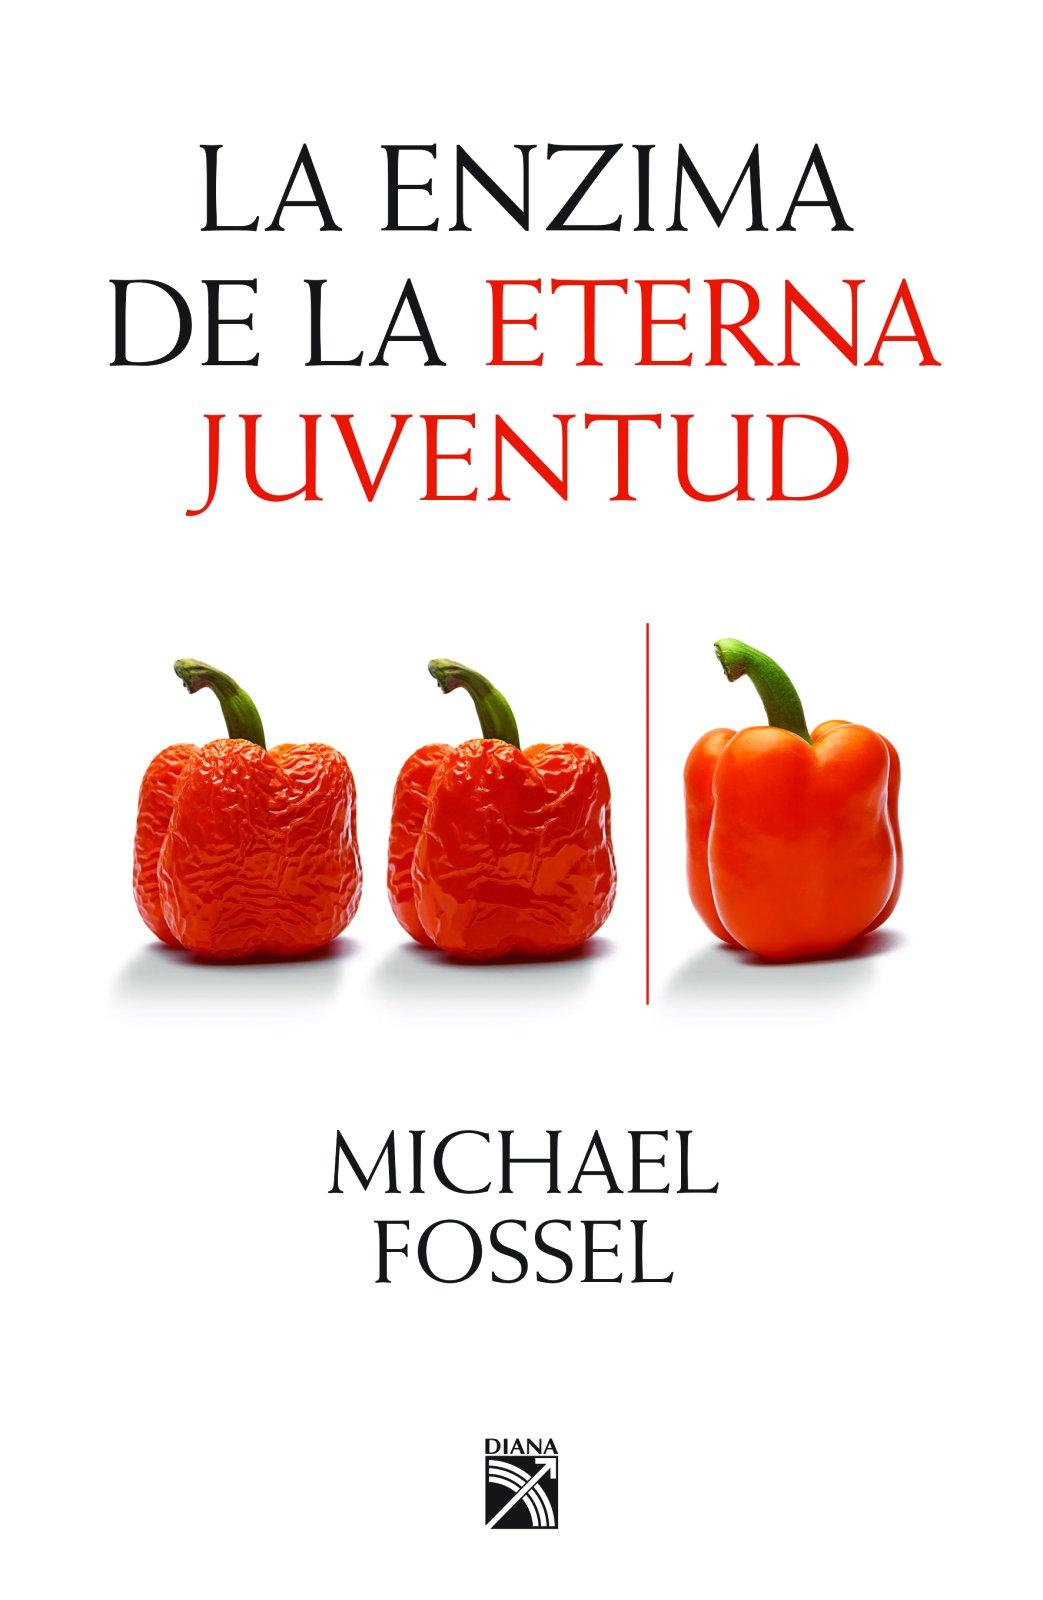 La Enzima de la Eterna Juventud: Amazon.es: Michael Fossel ...